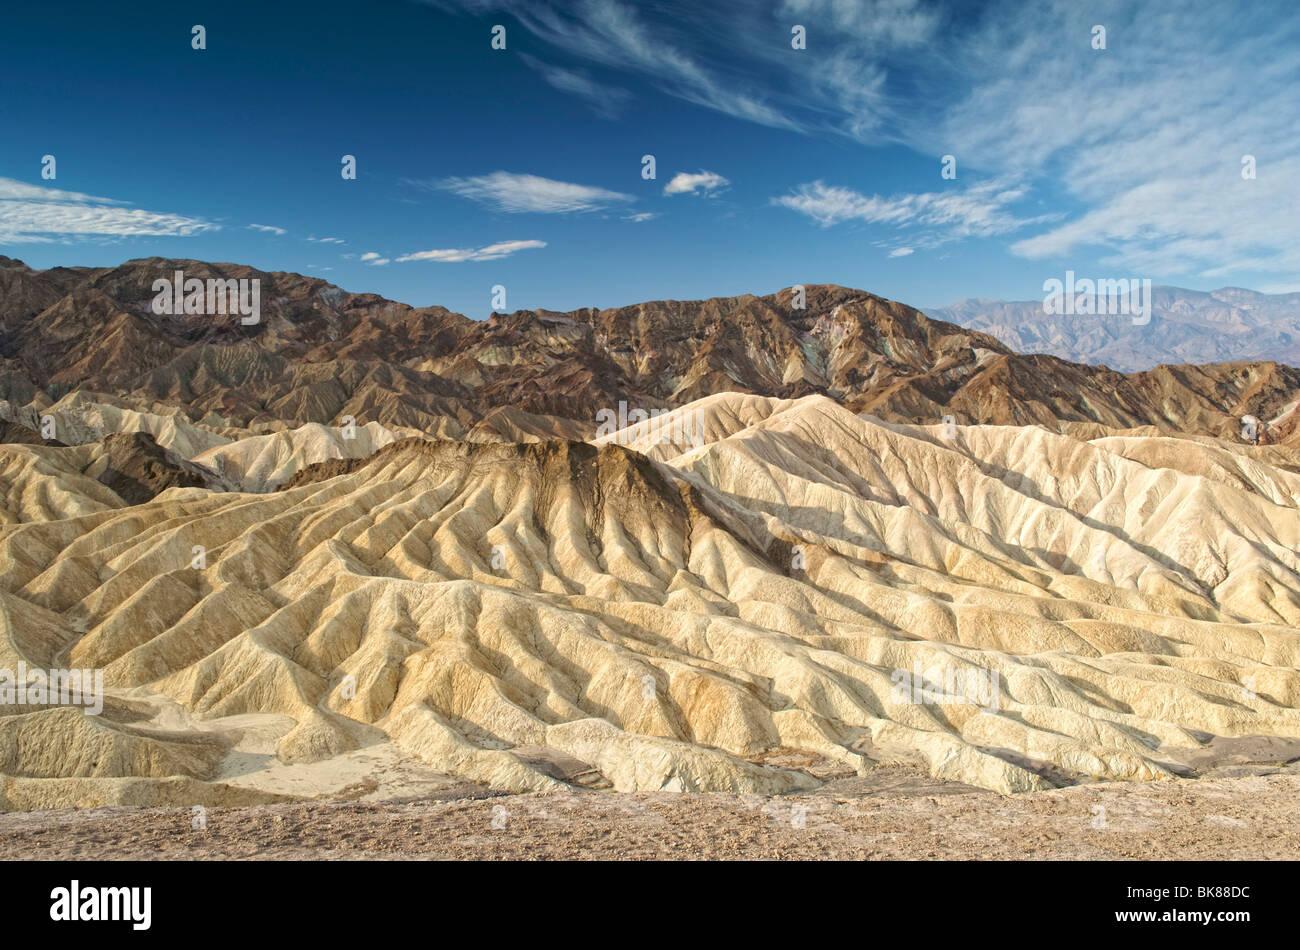 Zabriskie Point, Death Valley National Park, California, USA - Stock Image